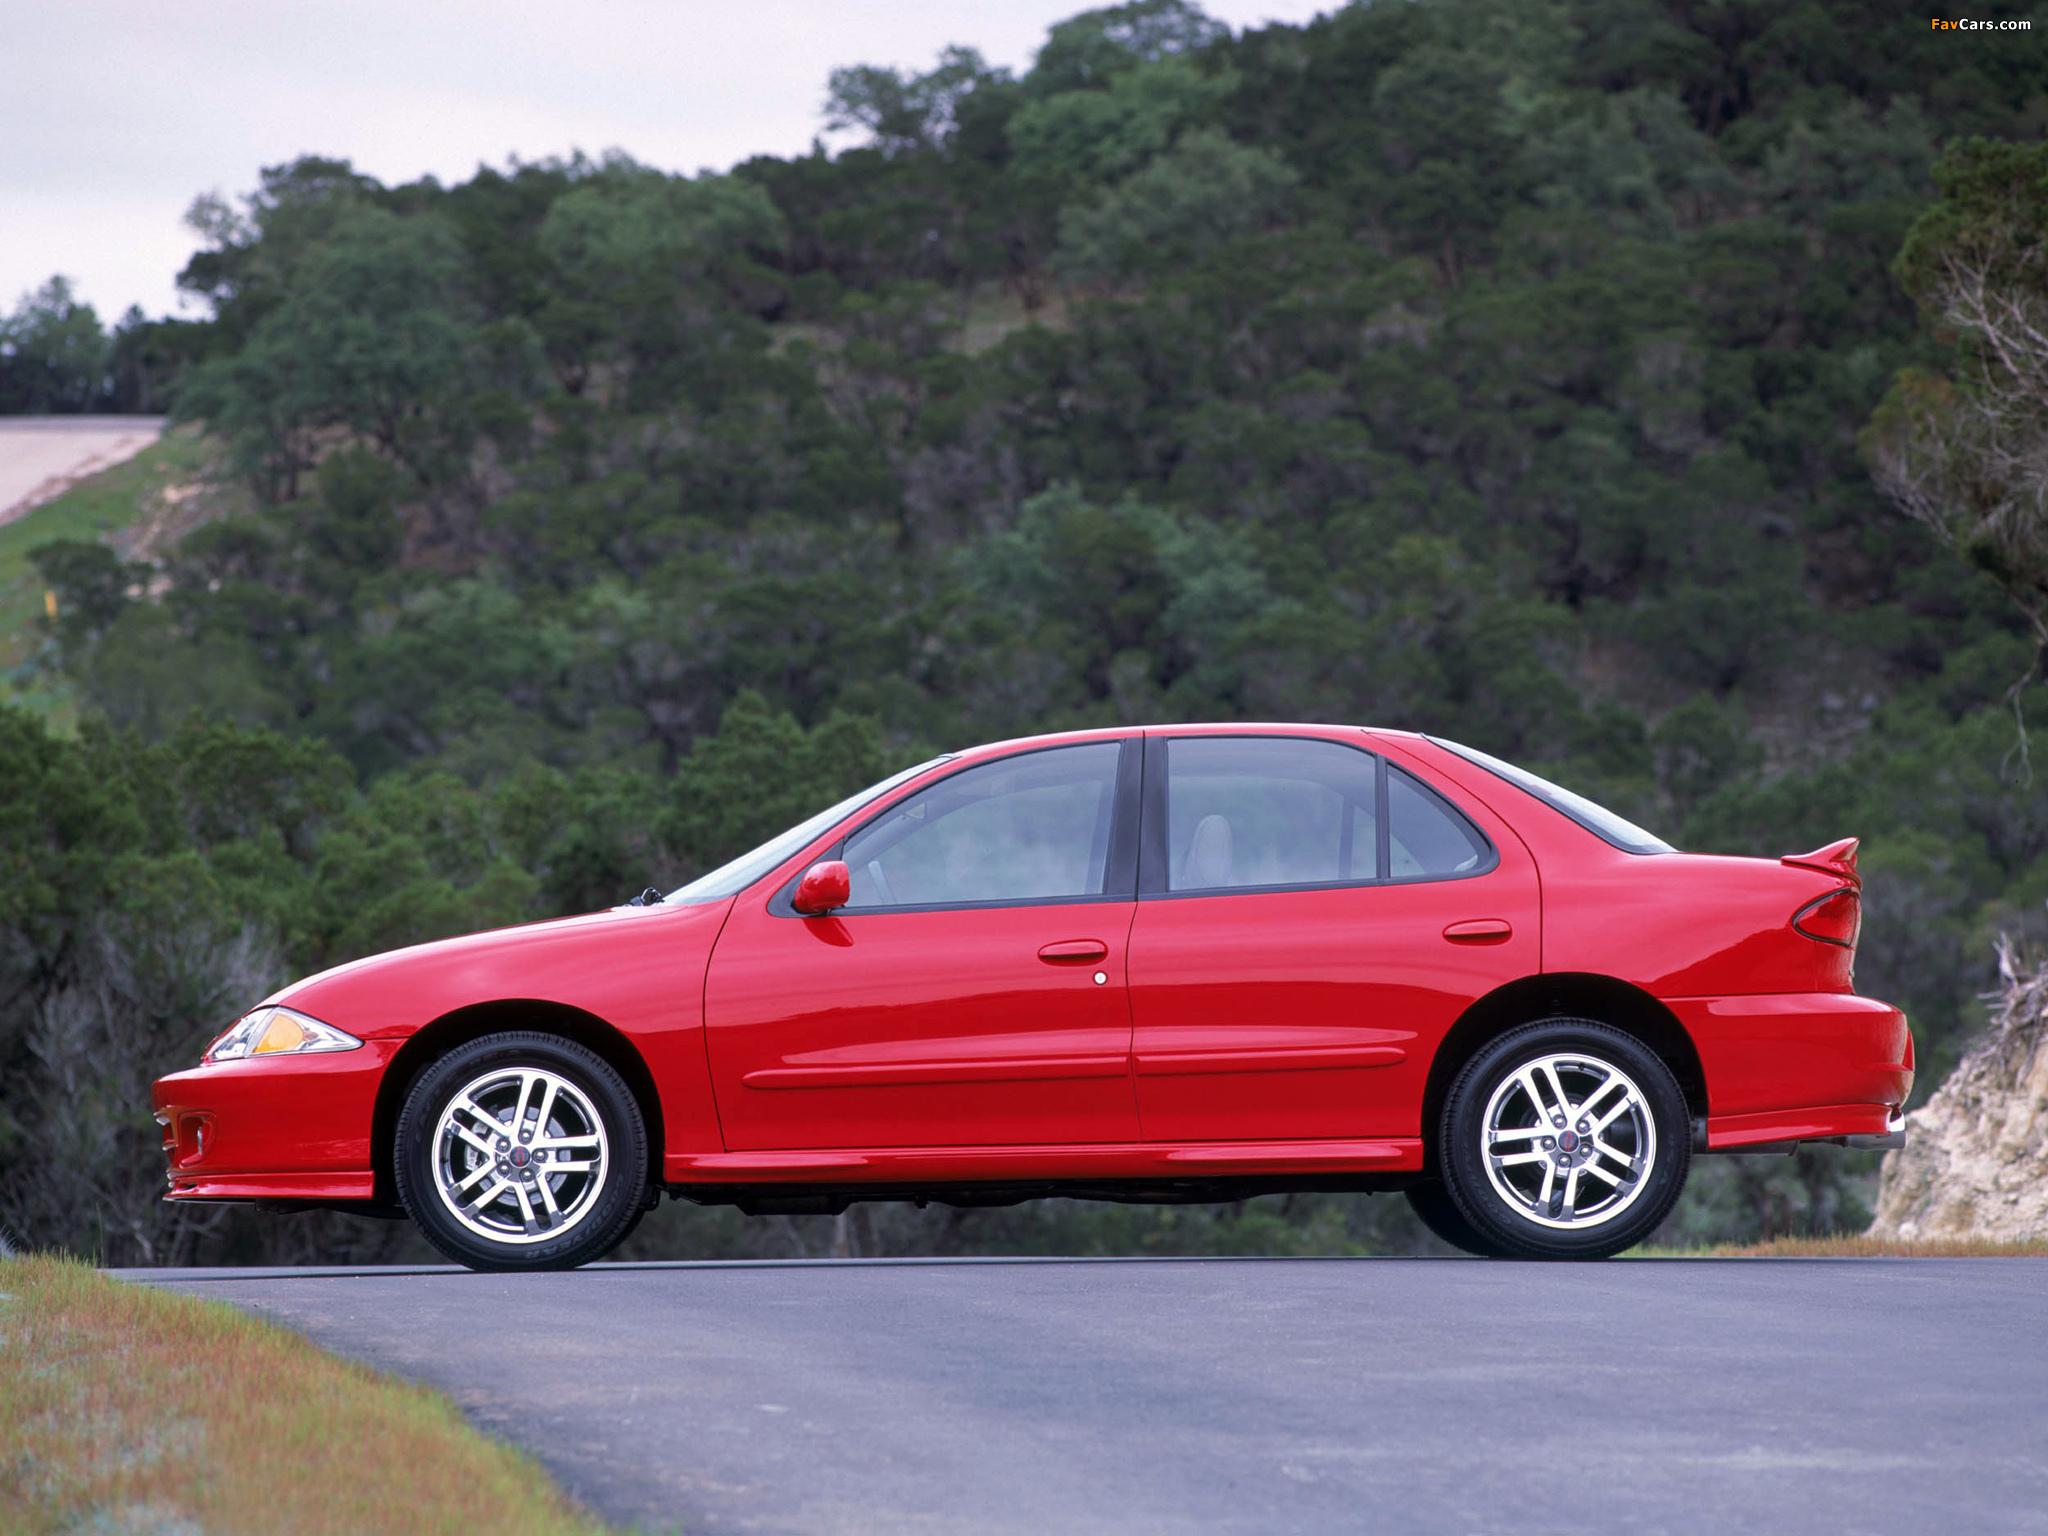 2001 Chevrolet Cavalier Image 9